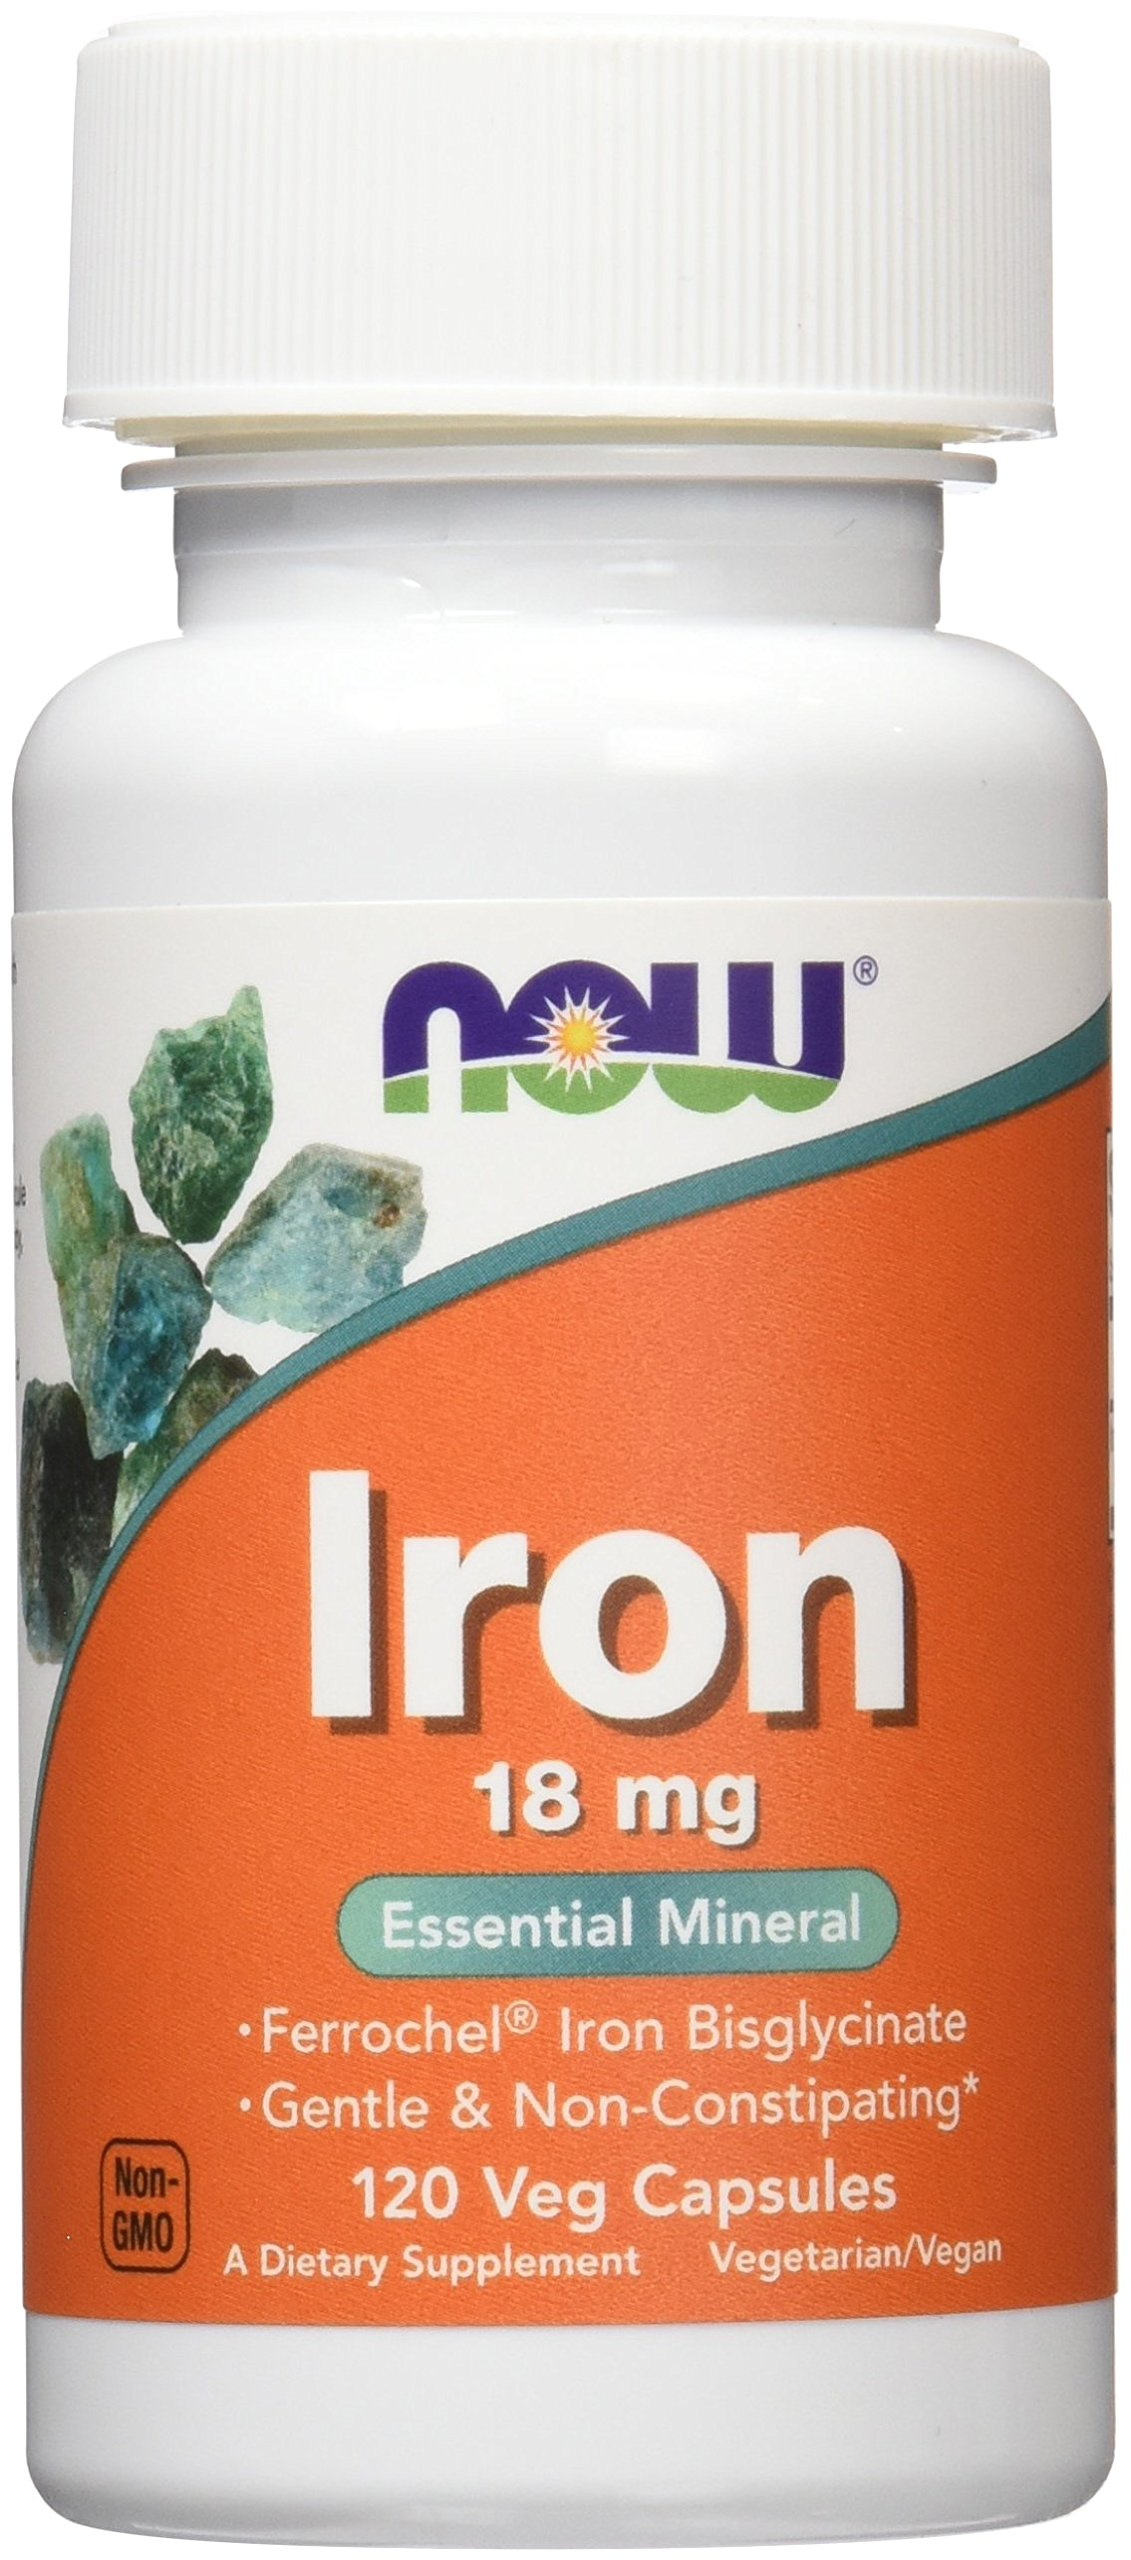 NOW Iron 18 mg,120 Veg Capsules